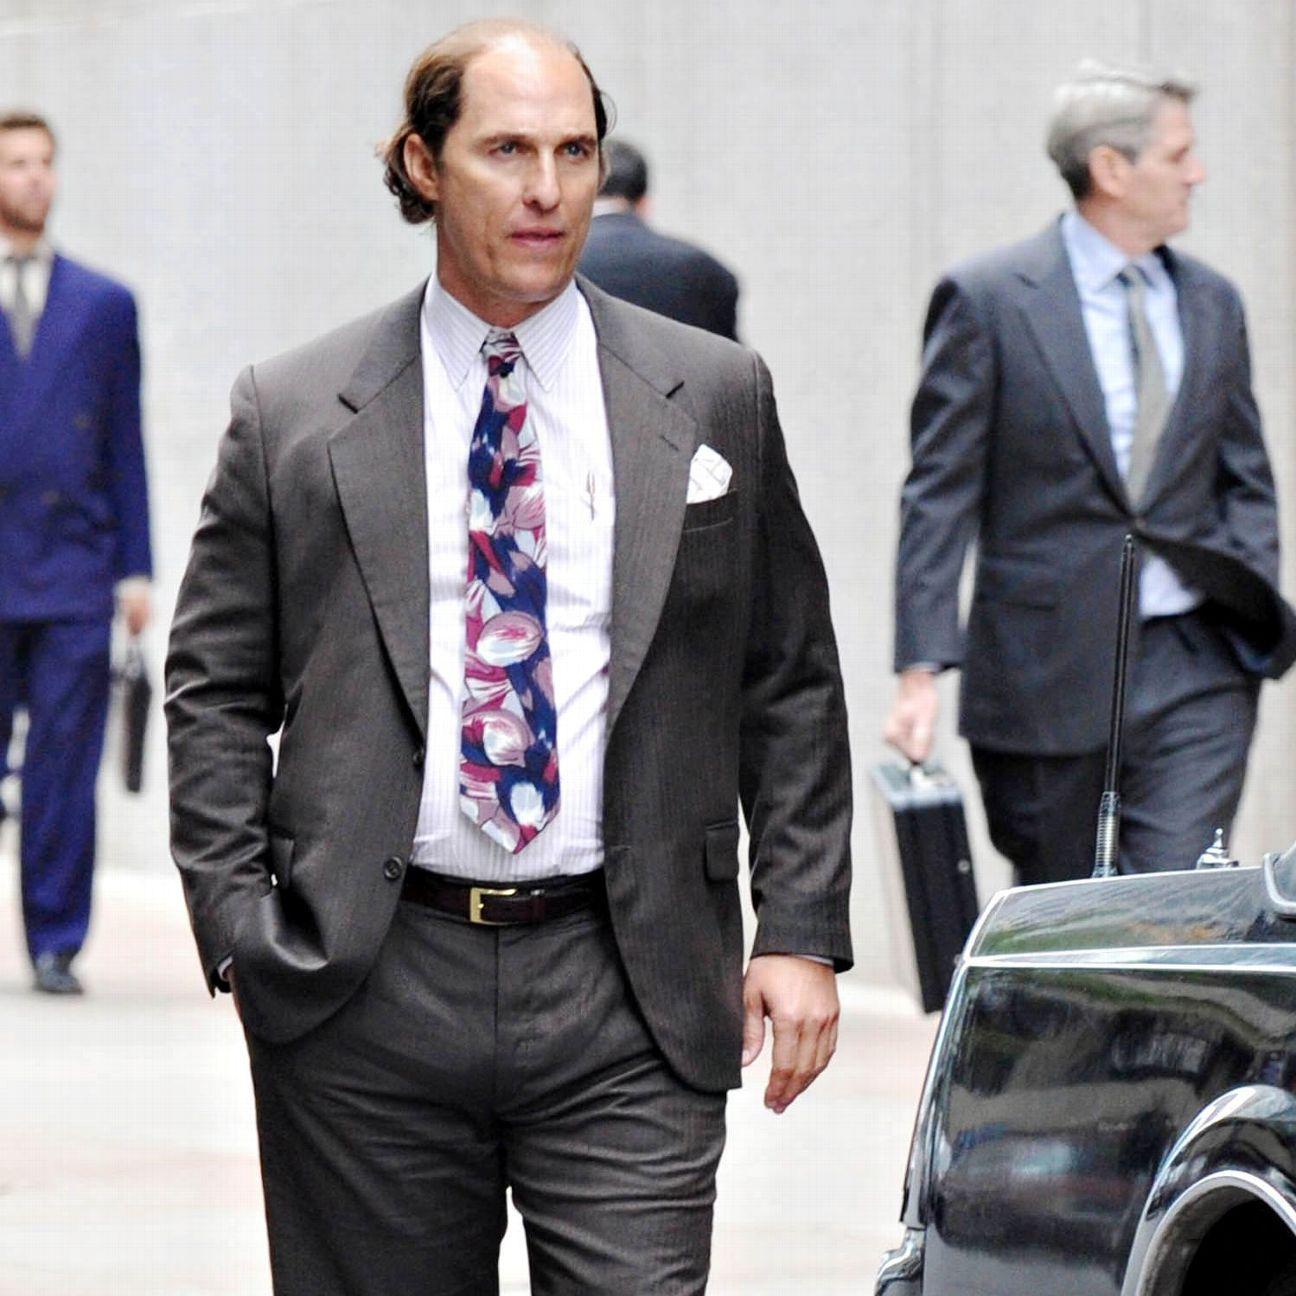 Matthew McConaughey got Redskins 'fired up' before E